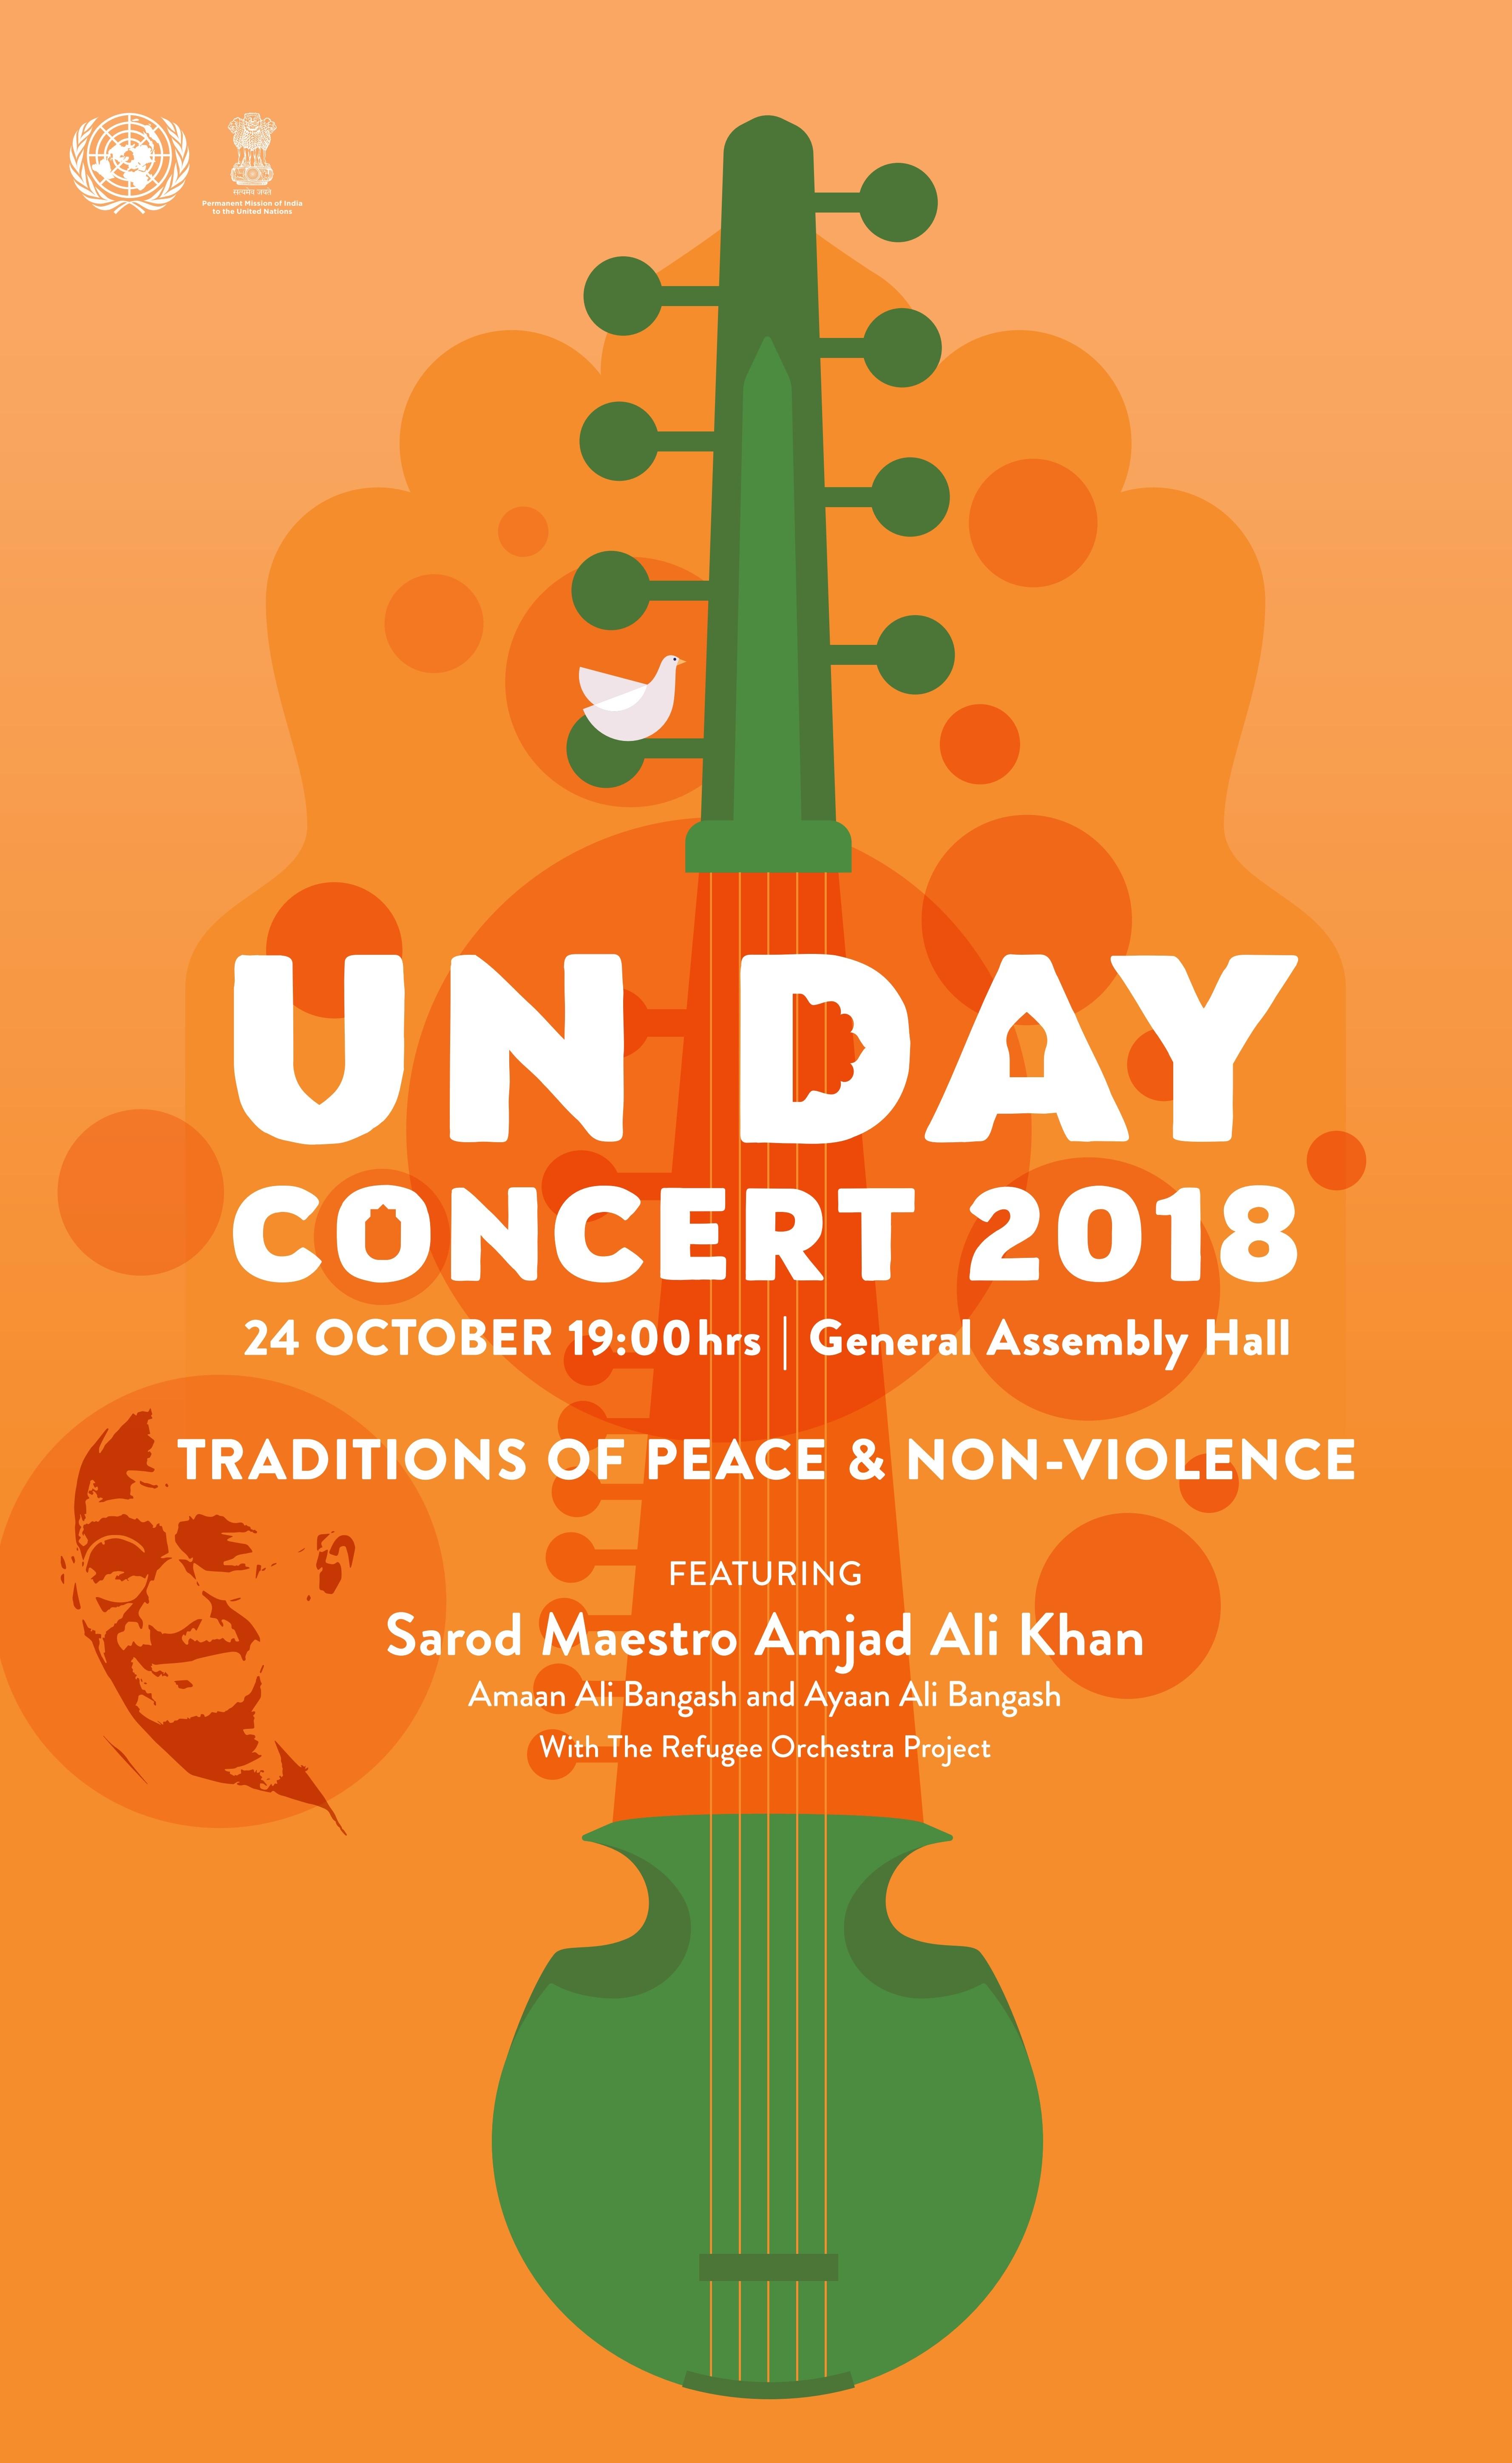 UN Day Concert 2018 poster